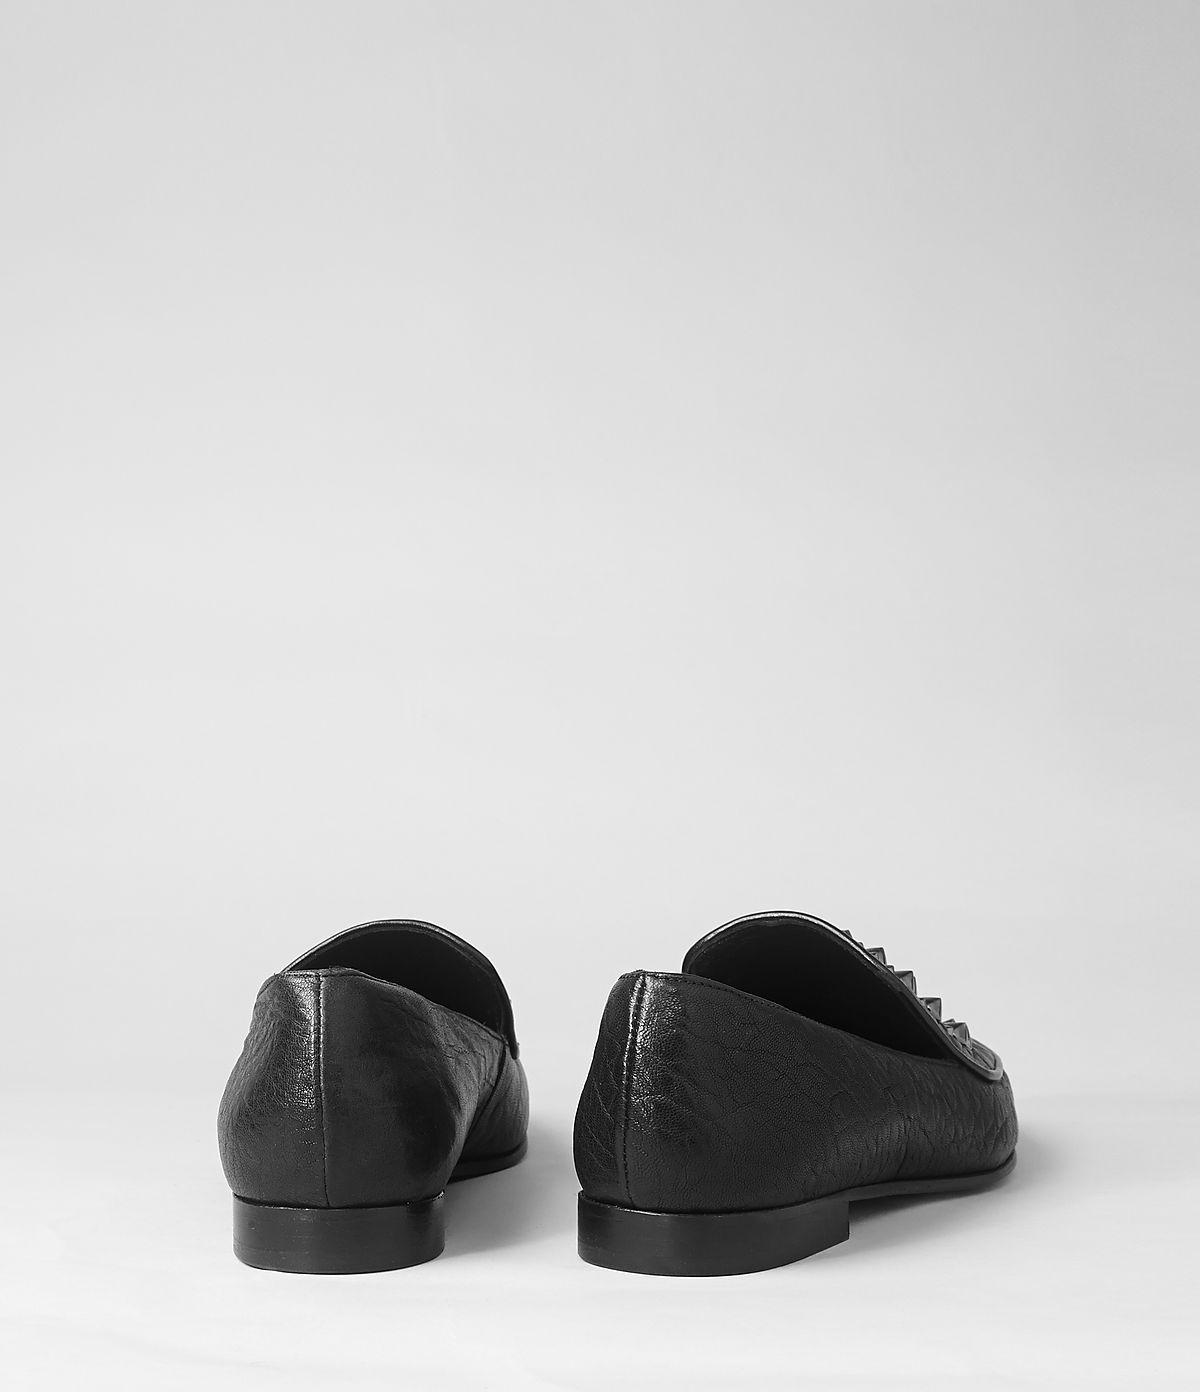 3c02db34b29 AllSaints Keiko Studded Loafer in Black - Lyst